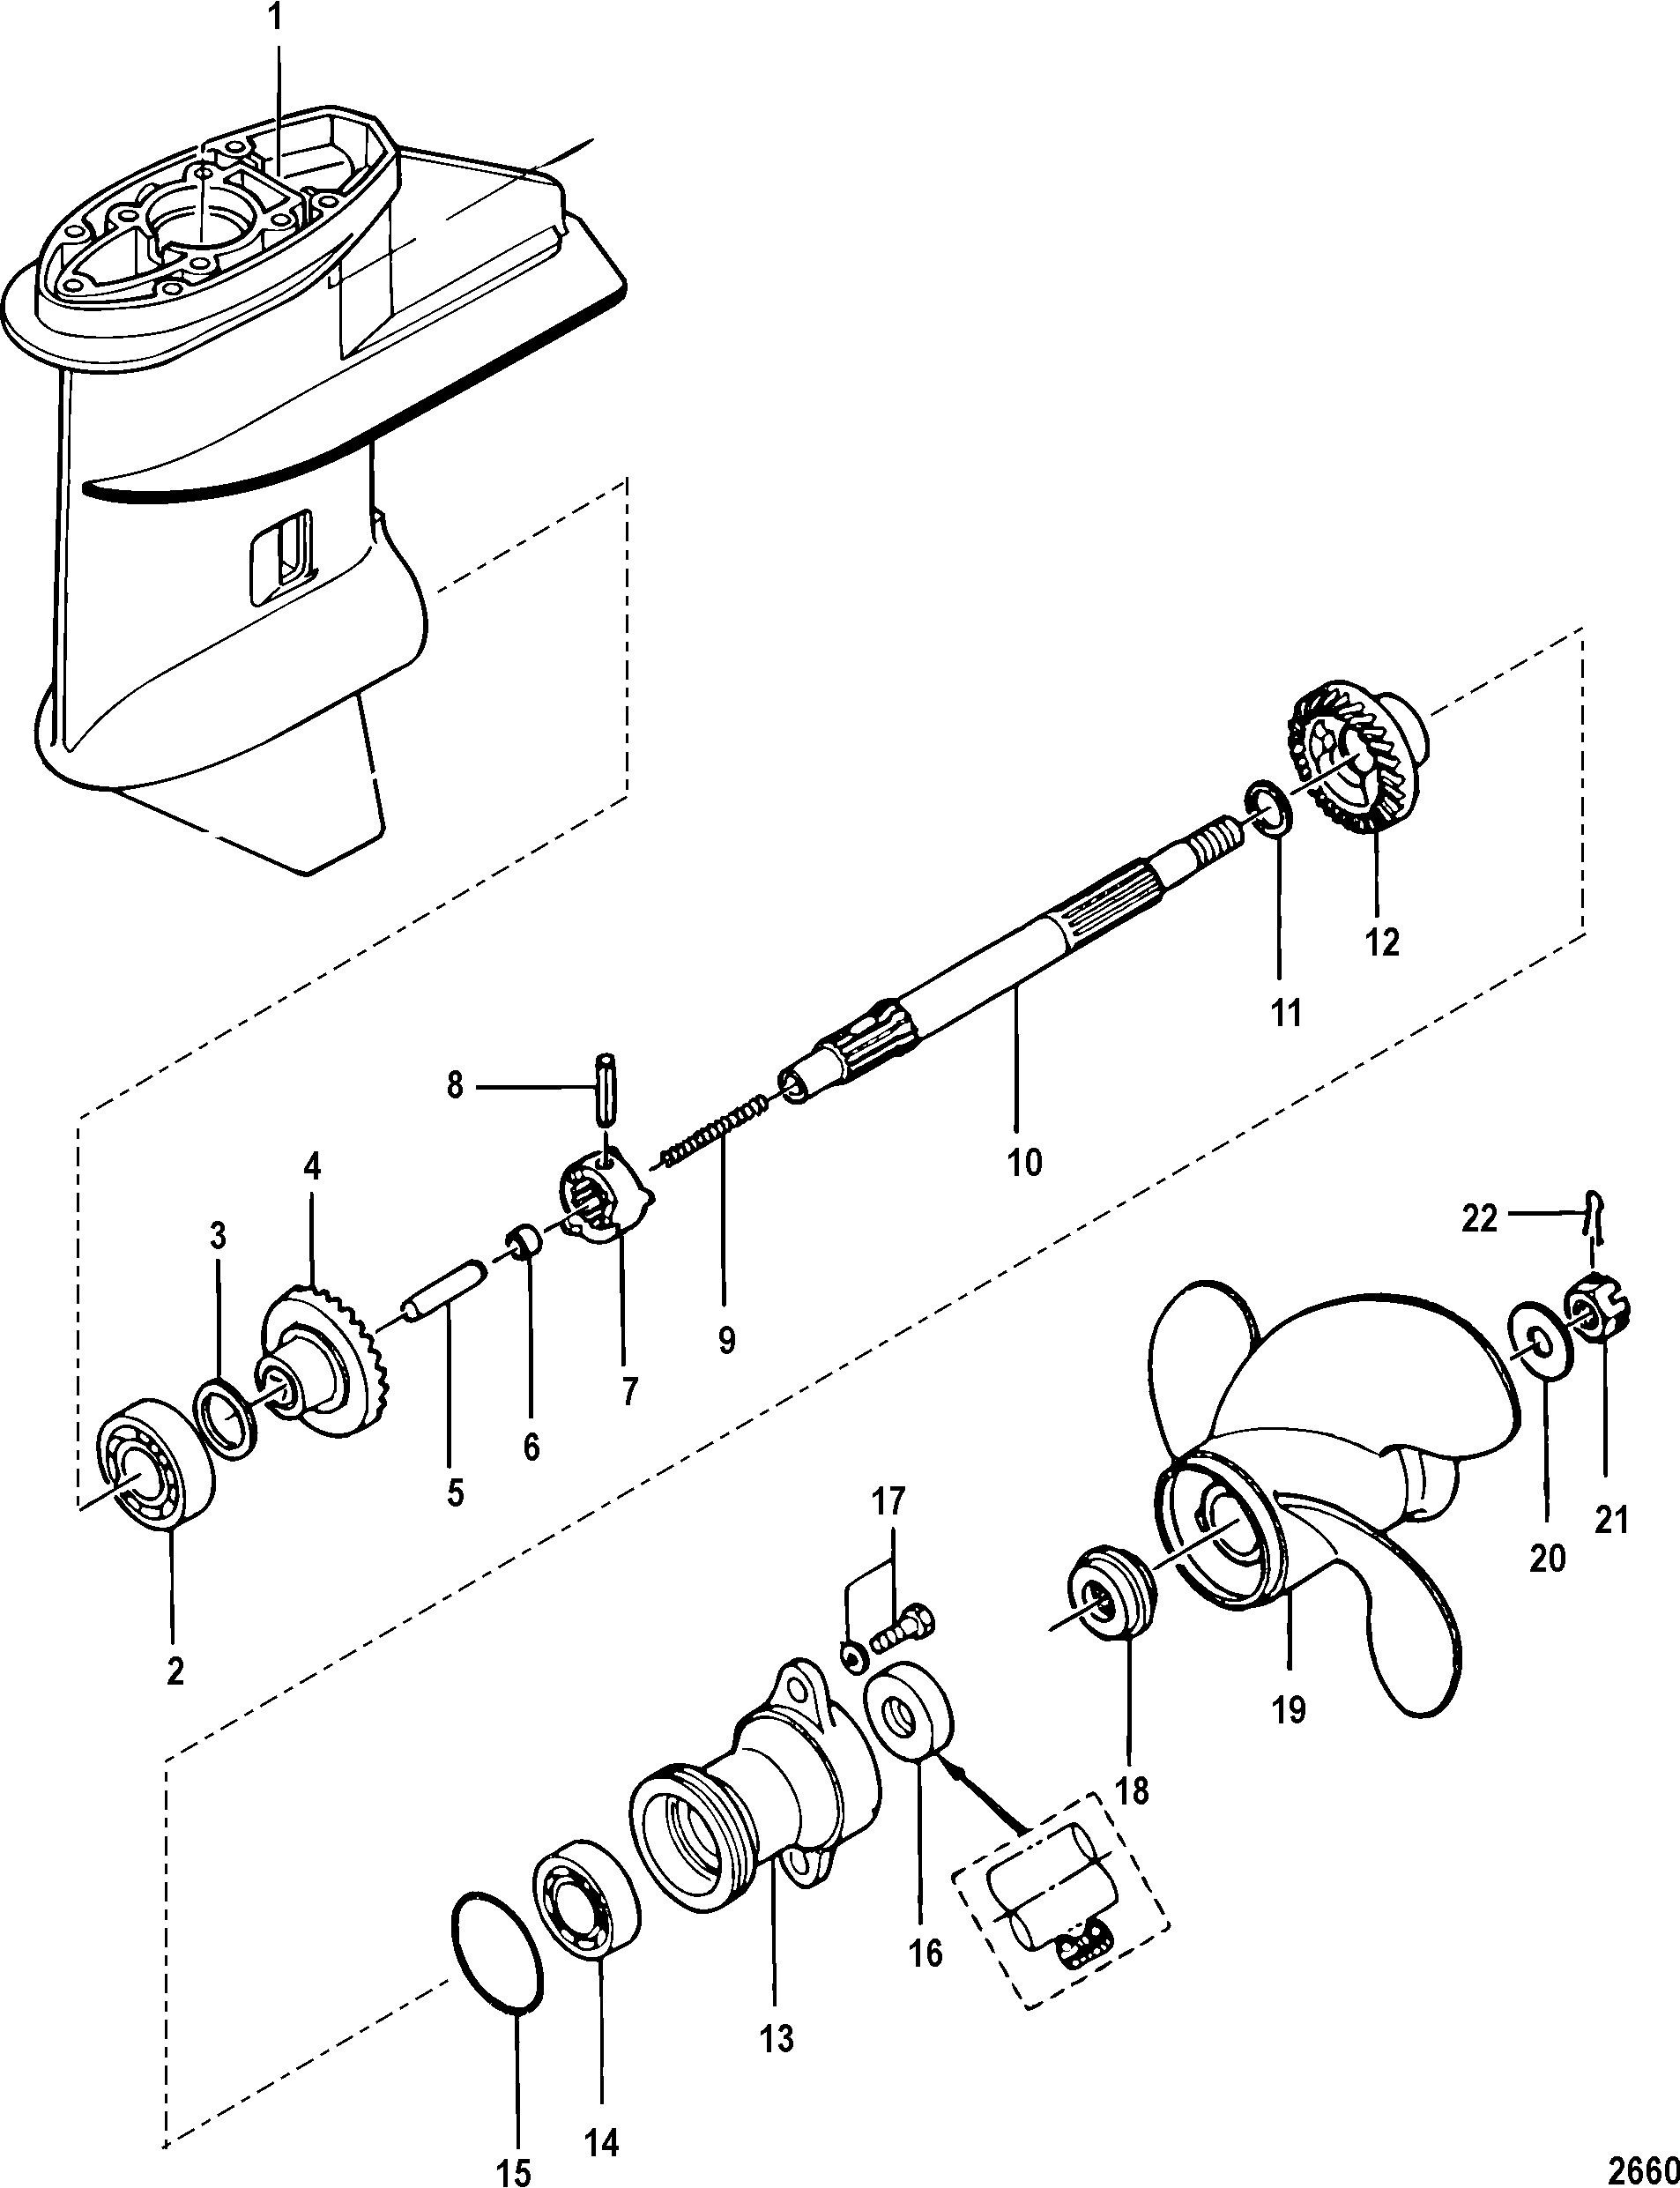 Mercury | MERCURY | 9.9 (4-STROKE)(209cc) | 0R042475 & Up | Gear Housing,  Propeller Shaft-Non Bigfoot